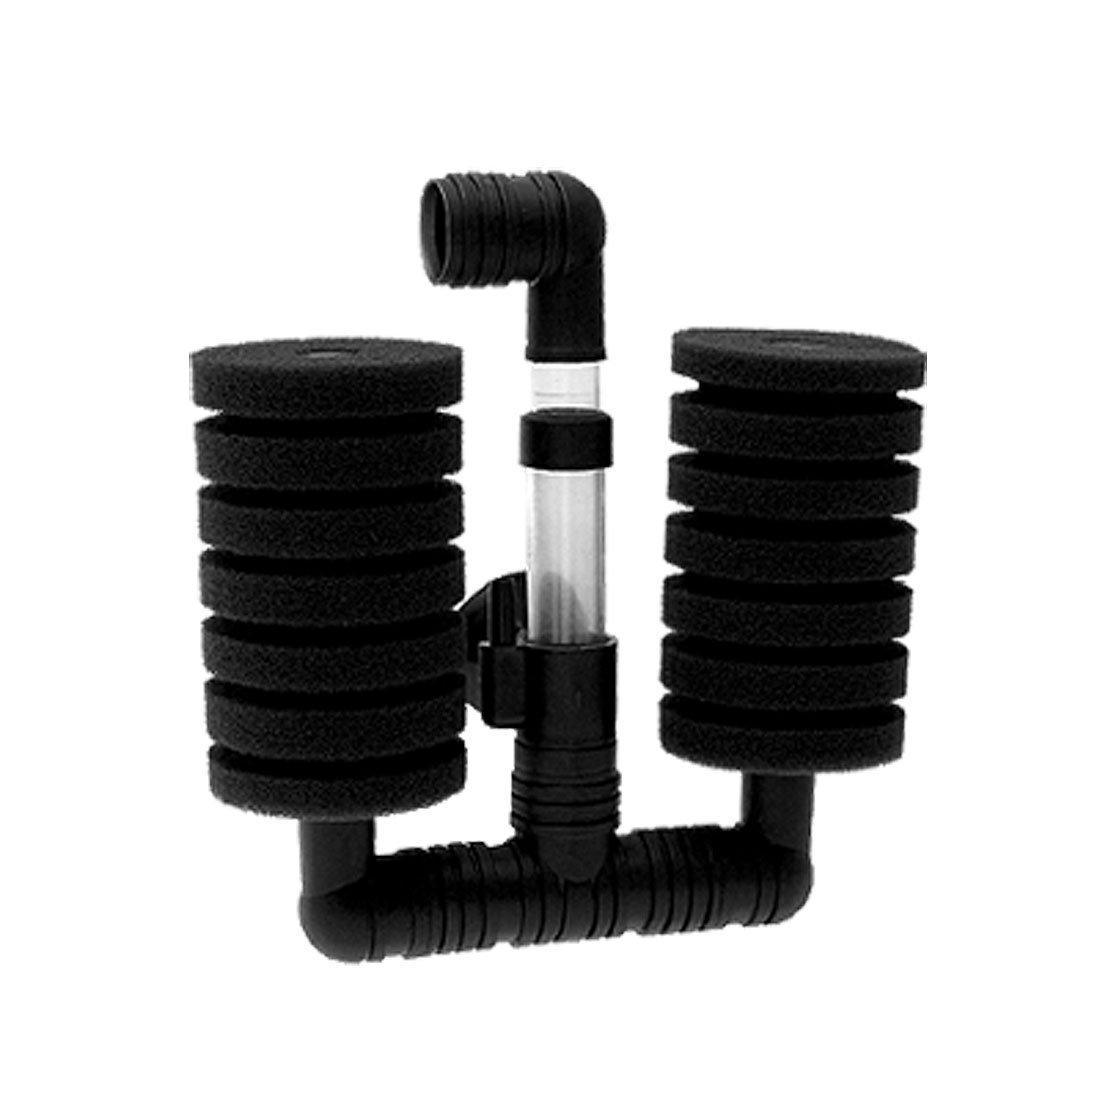 Sponge Filter Reviews: Round, Corner, Dual Corner Filters